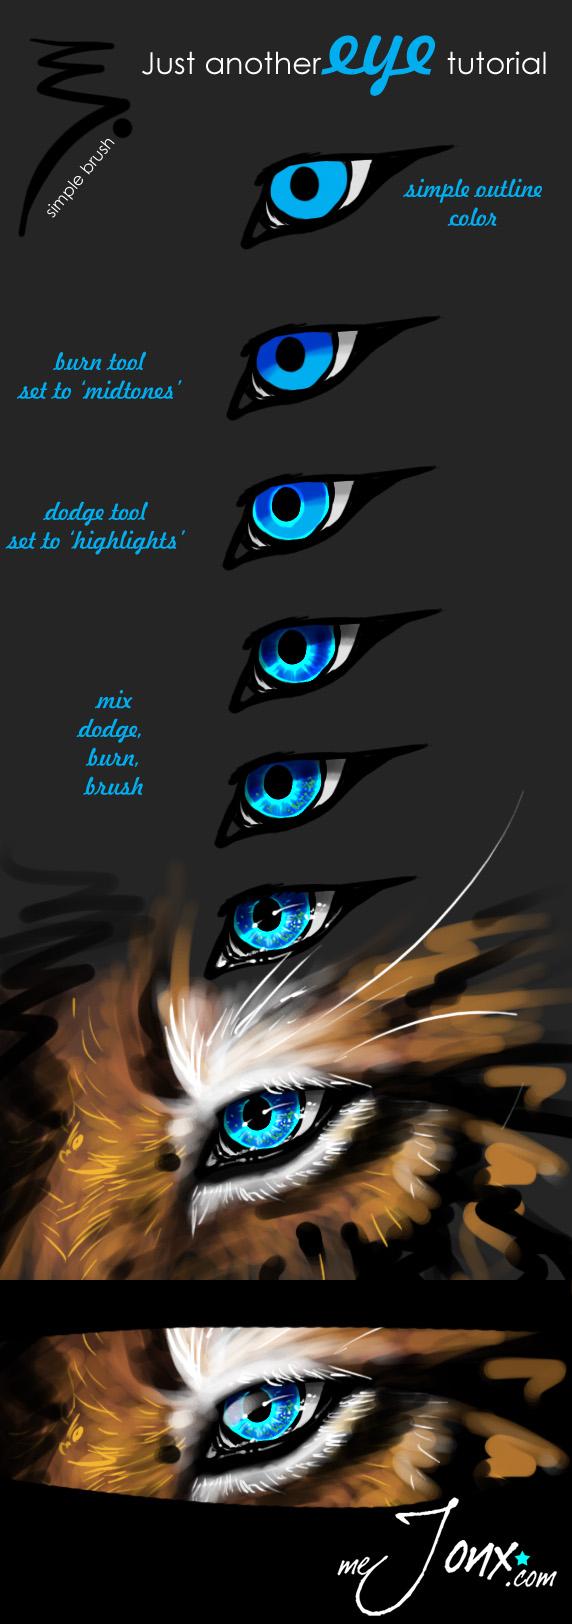 http://fc06.deviantart.net/fs71/f/2012/238/a/3/eye_tutorial_by_mejony-d5chcww.jpg